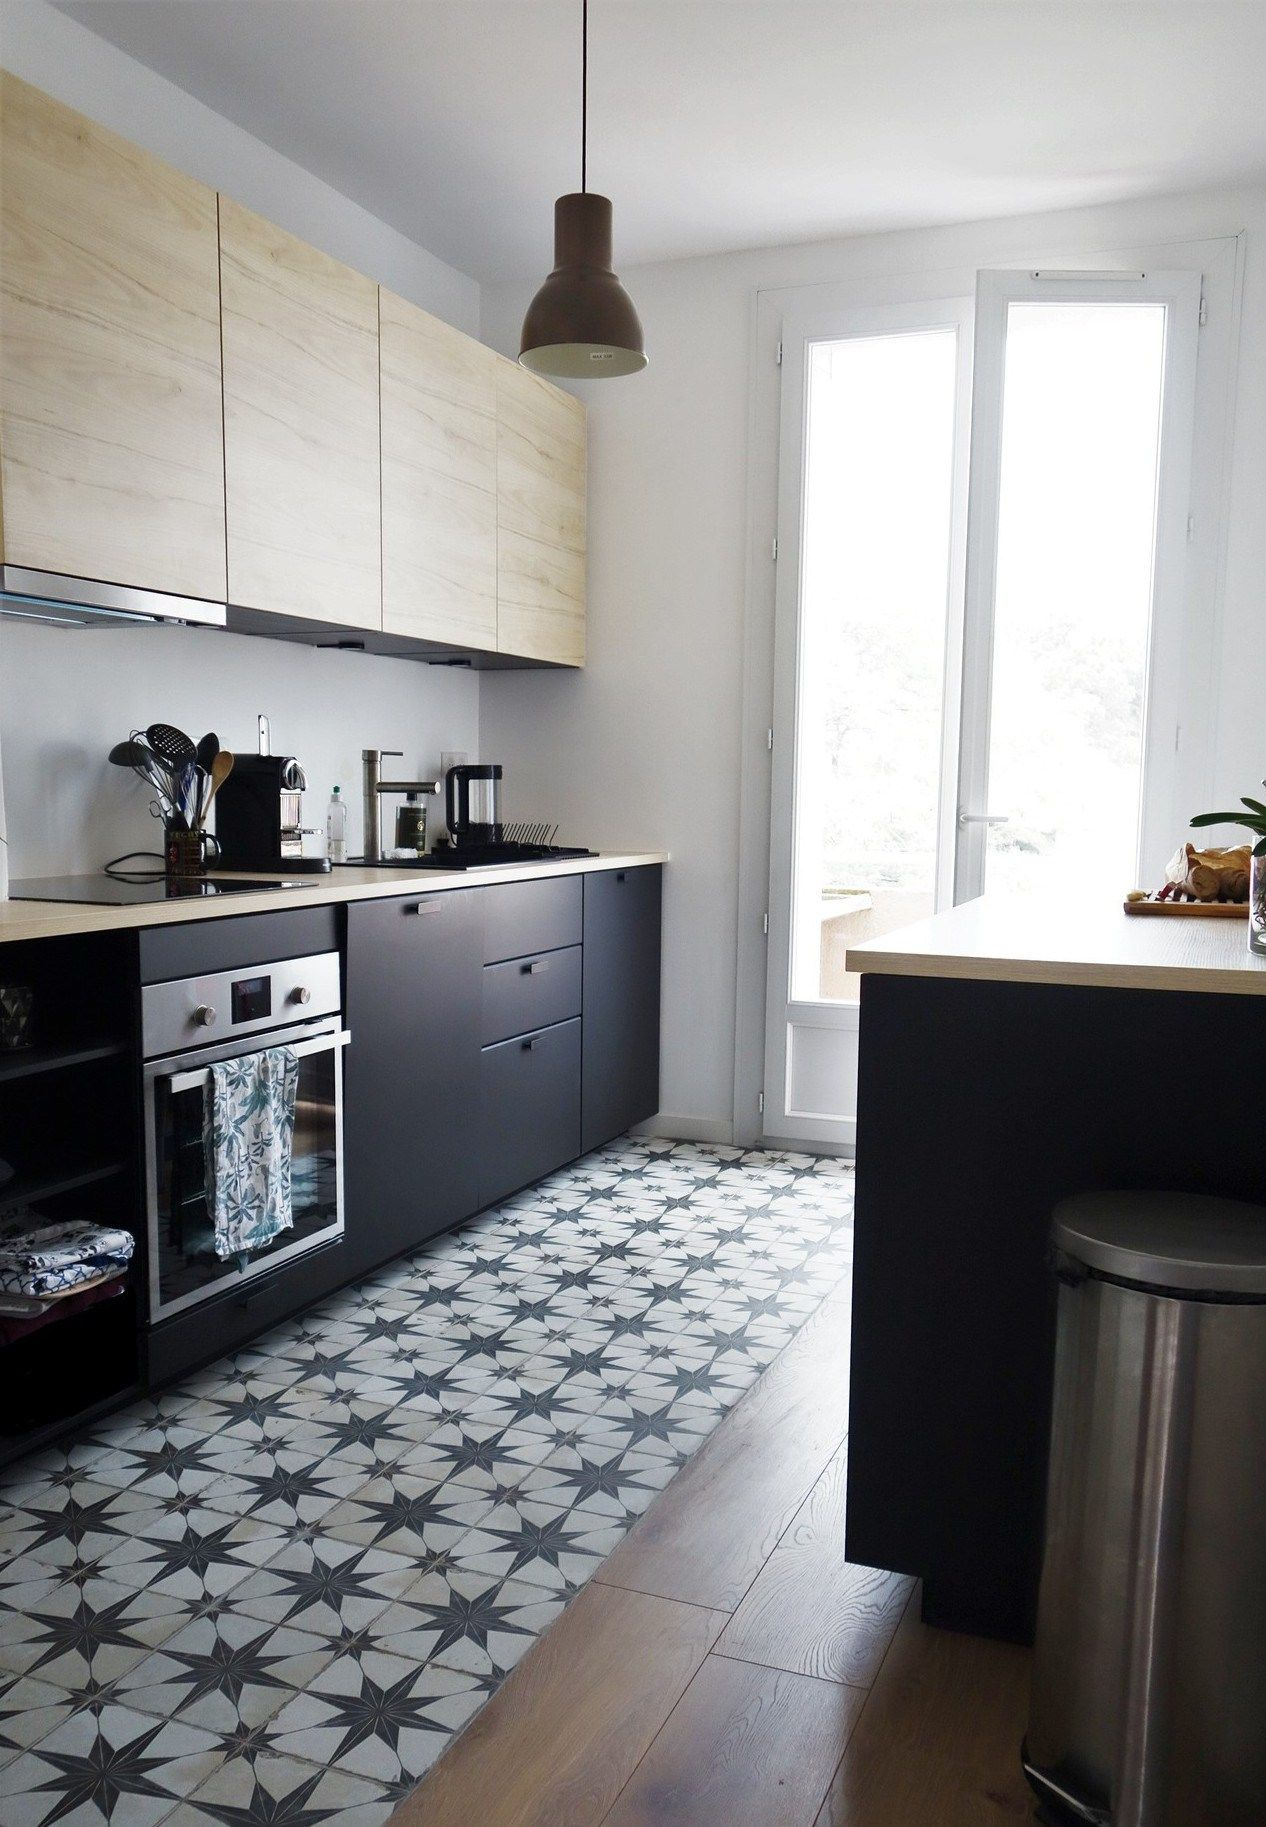 pin by jily design on kitchen idea kitchen interior tile to wood transition kitchen design on kitchen interior tiles id=39165